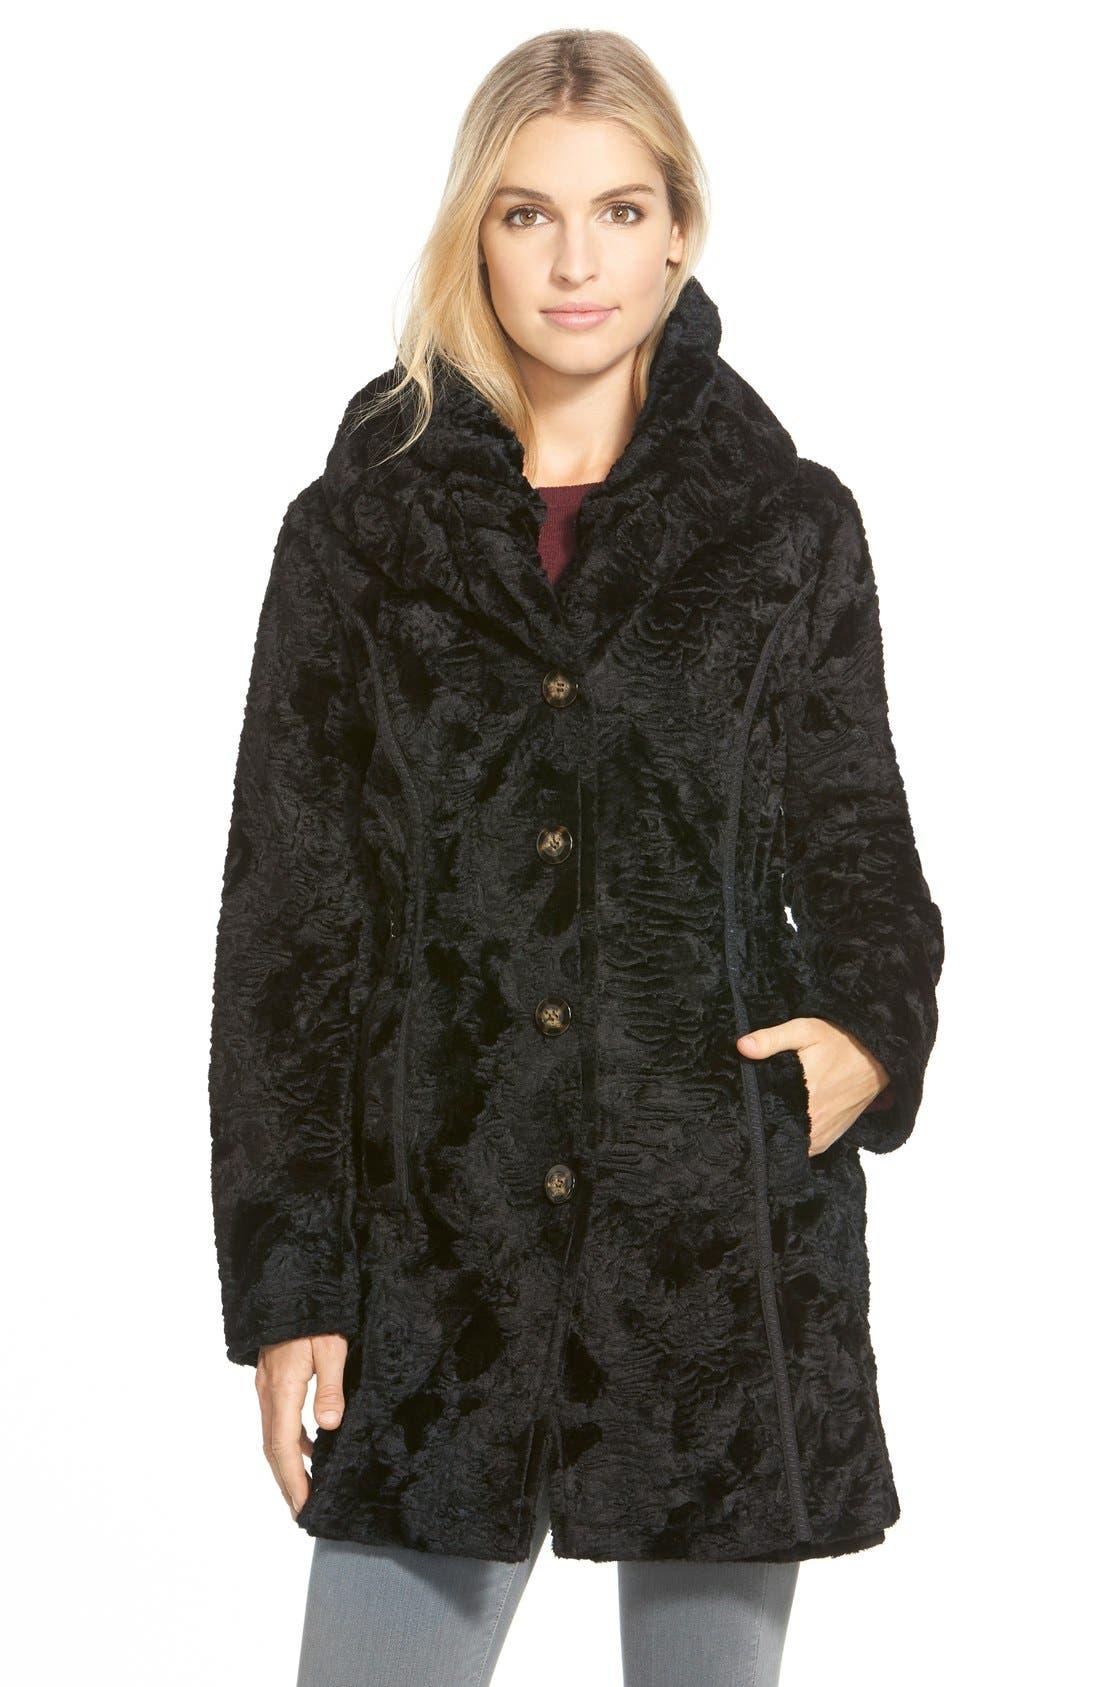 Laundry by ShelliSegalReversible FauxPersian Lamb Fur Coat,                             Main thumbnail 1, color,                             001